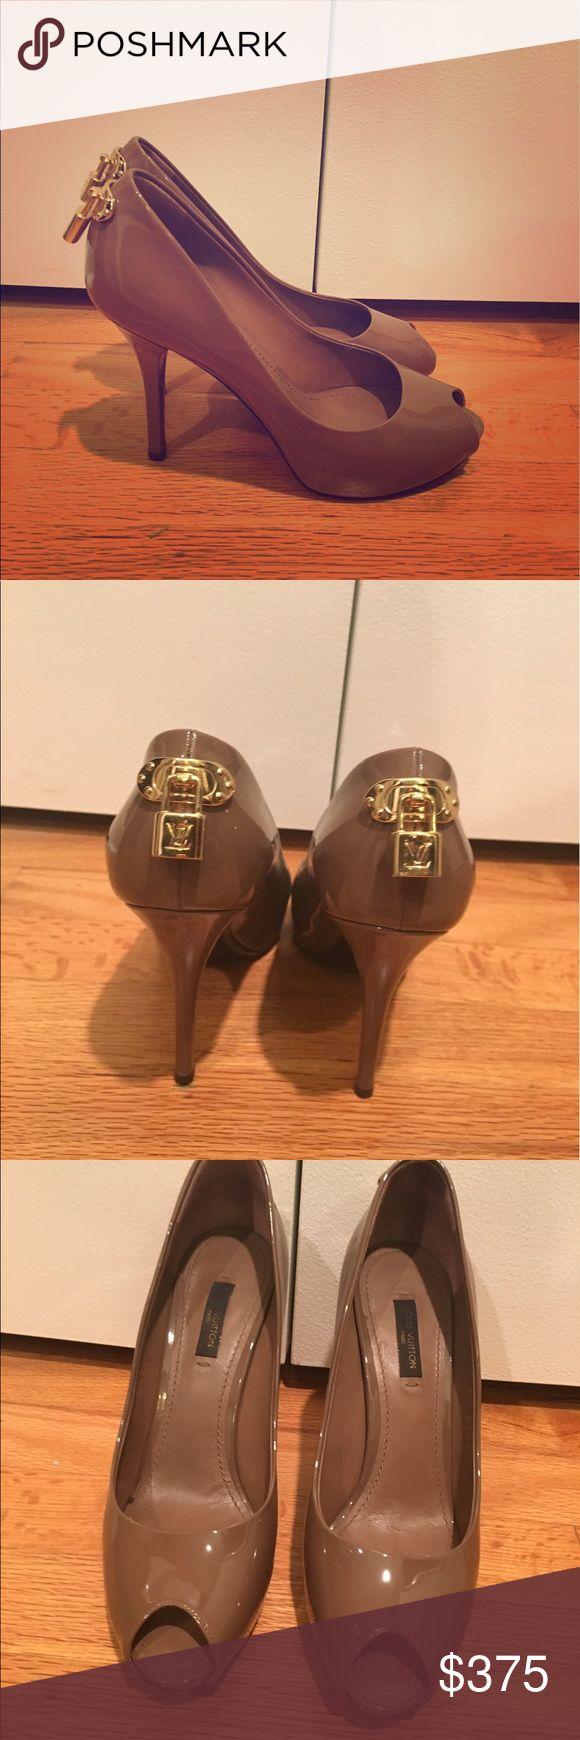 Louis Vuitton Pumps Louis Vuitton peep toe pump. Taupe color. Size 37 (I wear a 7 and they fit perfect). 9cm heal. Louis Vuitton Shoes Heels